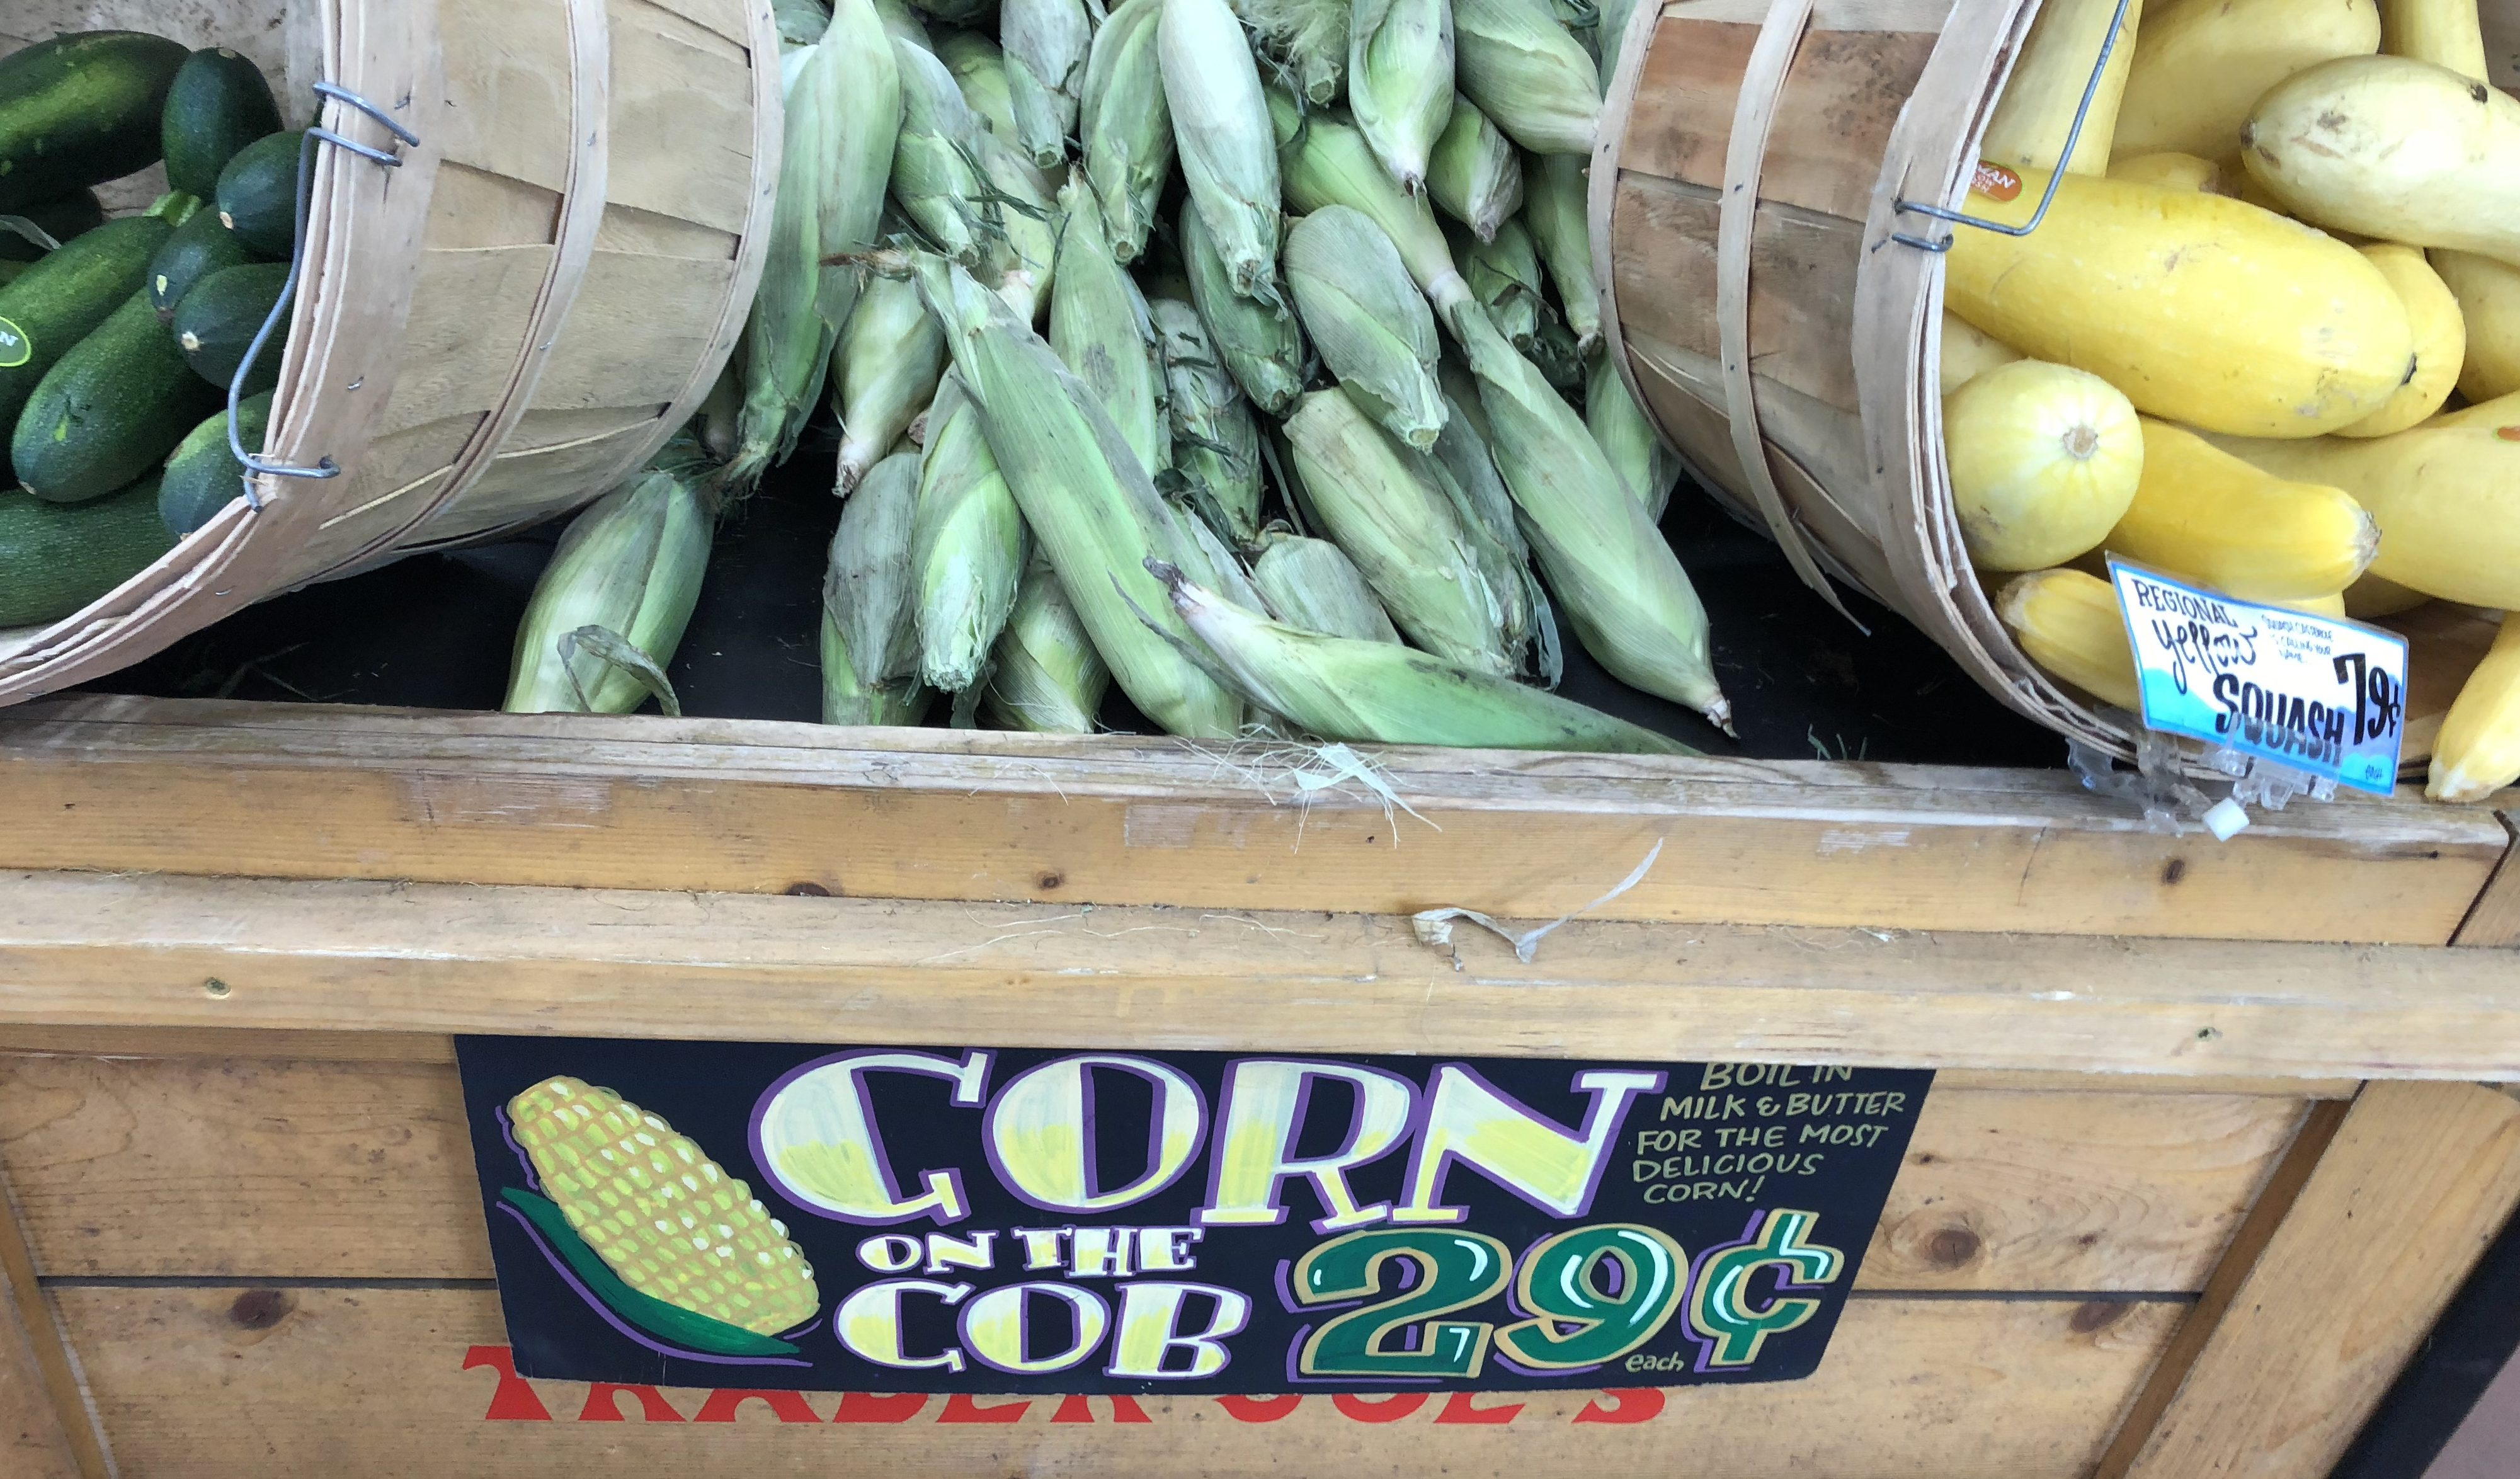 trader joes deals – corn on the cob